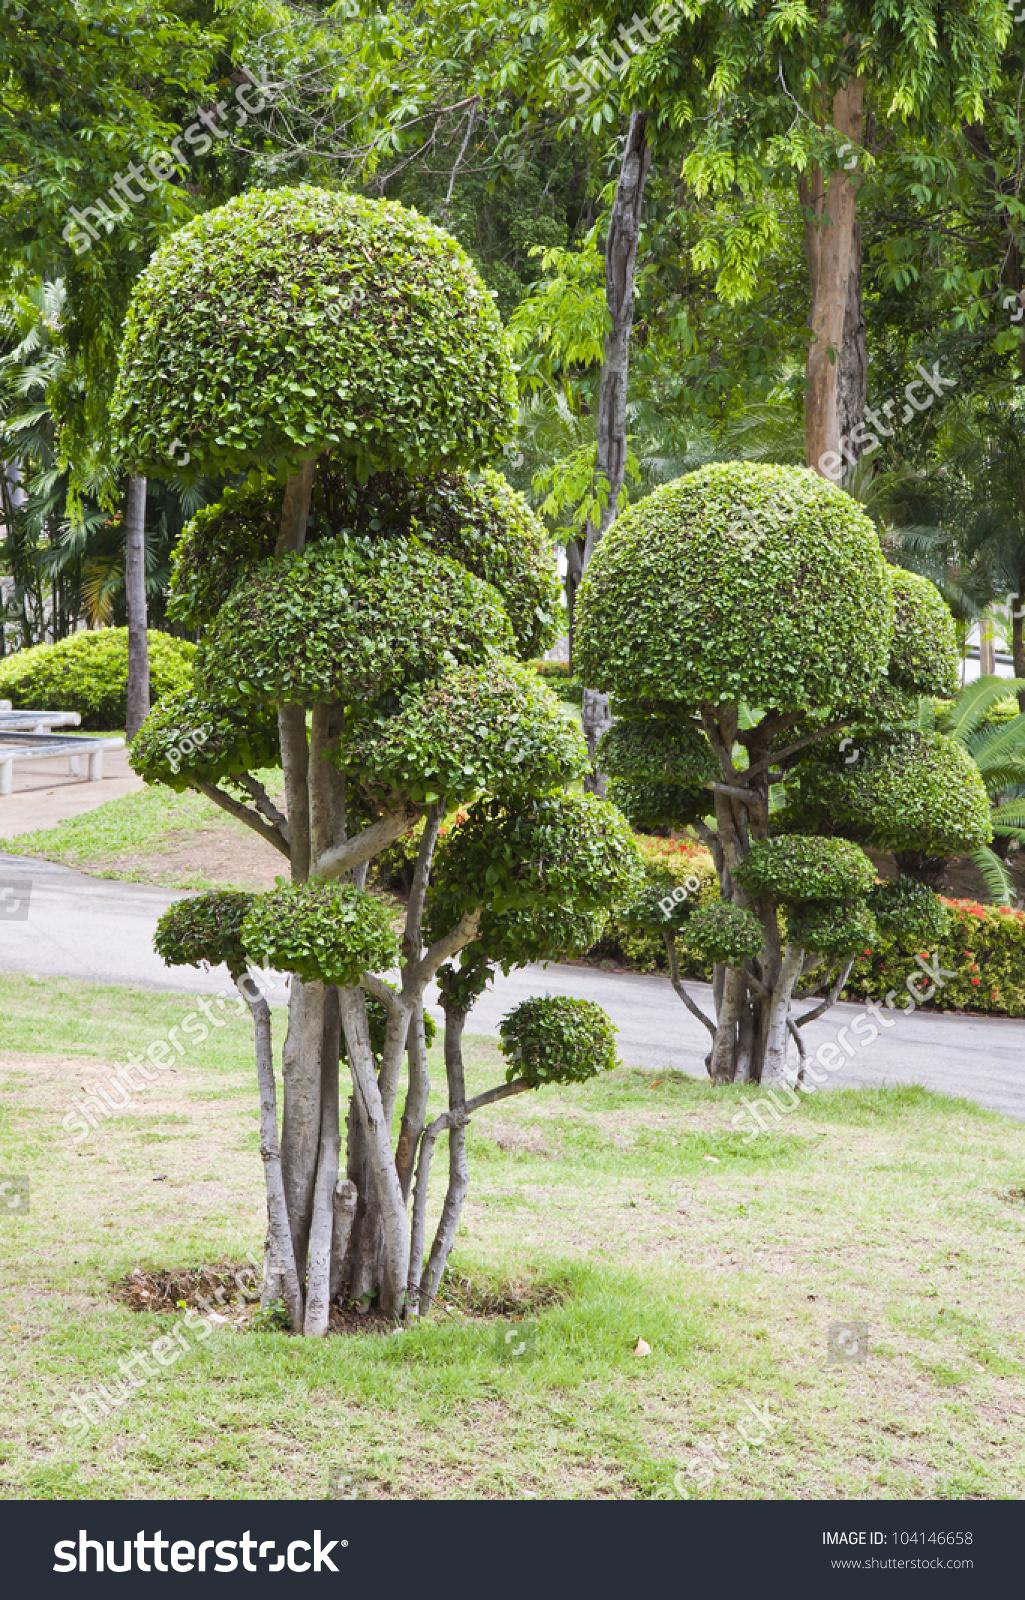 Beautiful dwarf tree garden in pattaya stock photo for Garden city trees